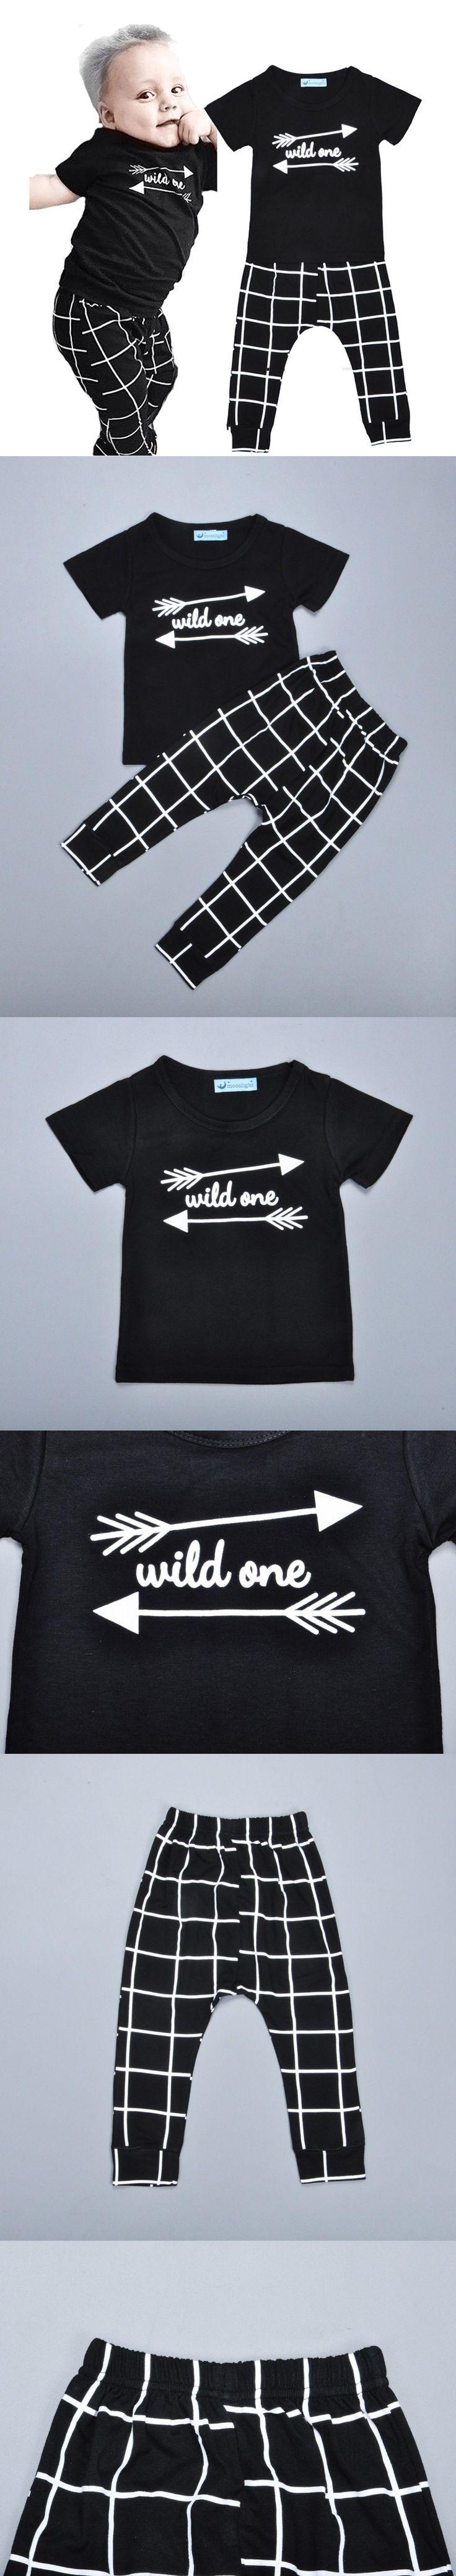 Baby boy clothing set Cartoon letter printing short T-shirt t shirt tops + Plaid harem pants fashion black kids boy clothes set $9.22